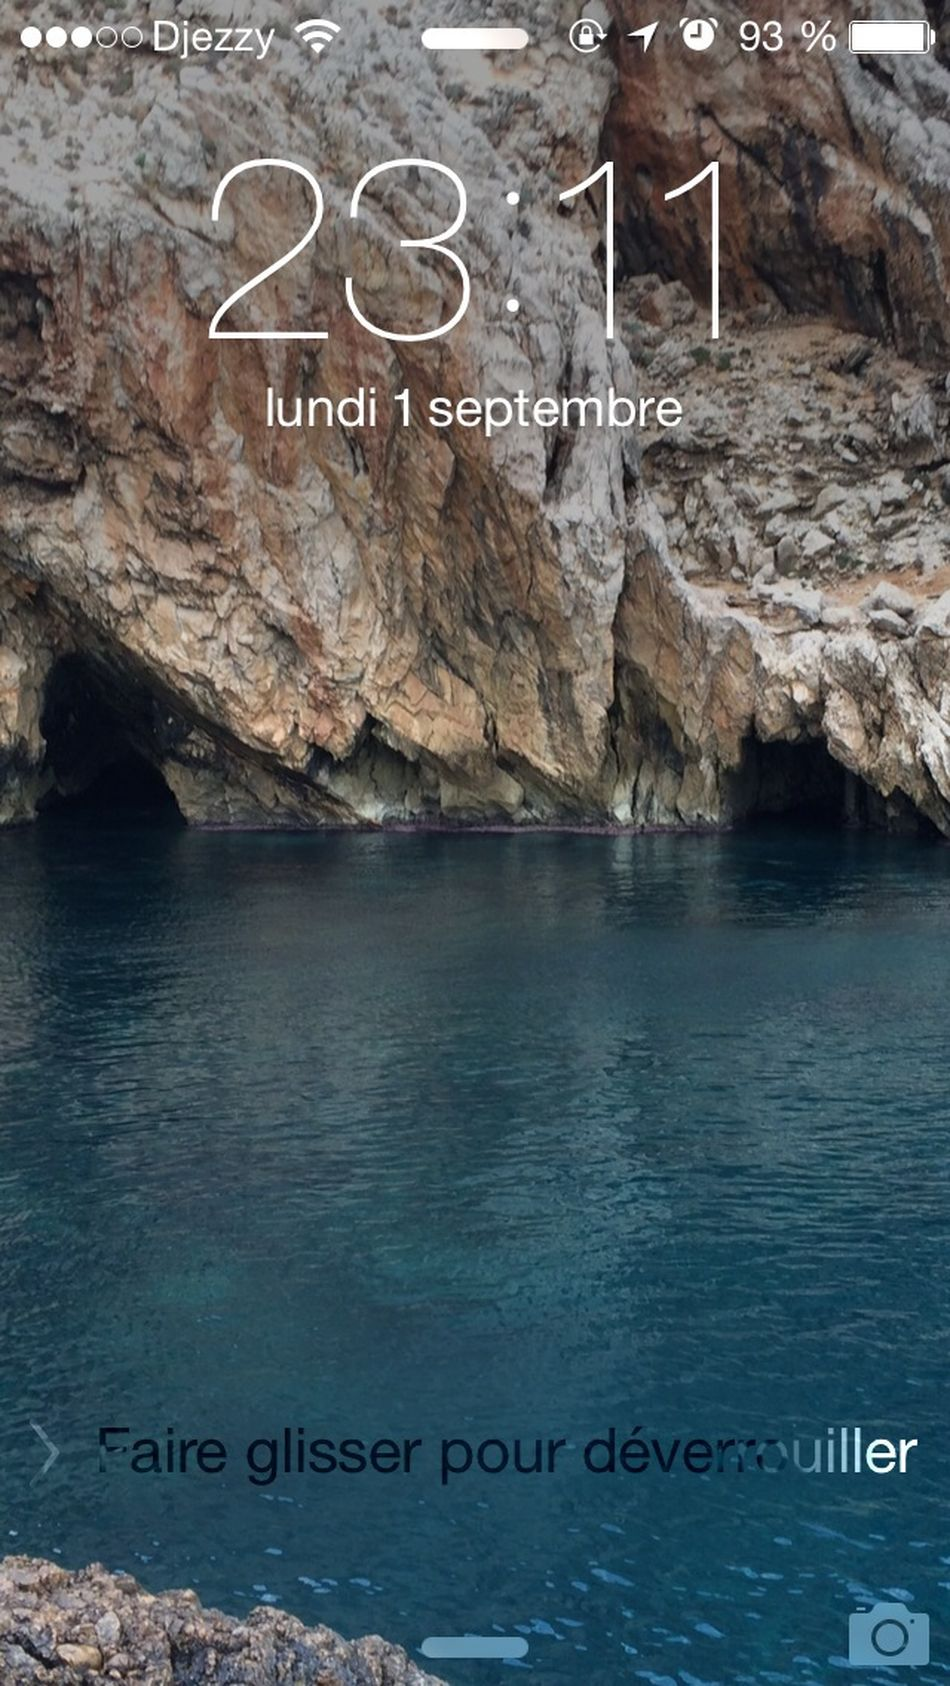 Ecran D'accueil #iphone Iphone5s IPhone Wallpaper IOS 7